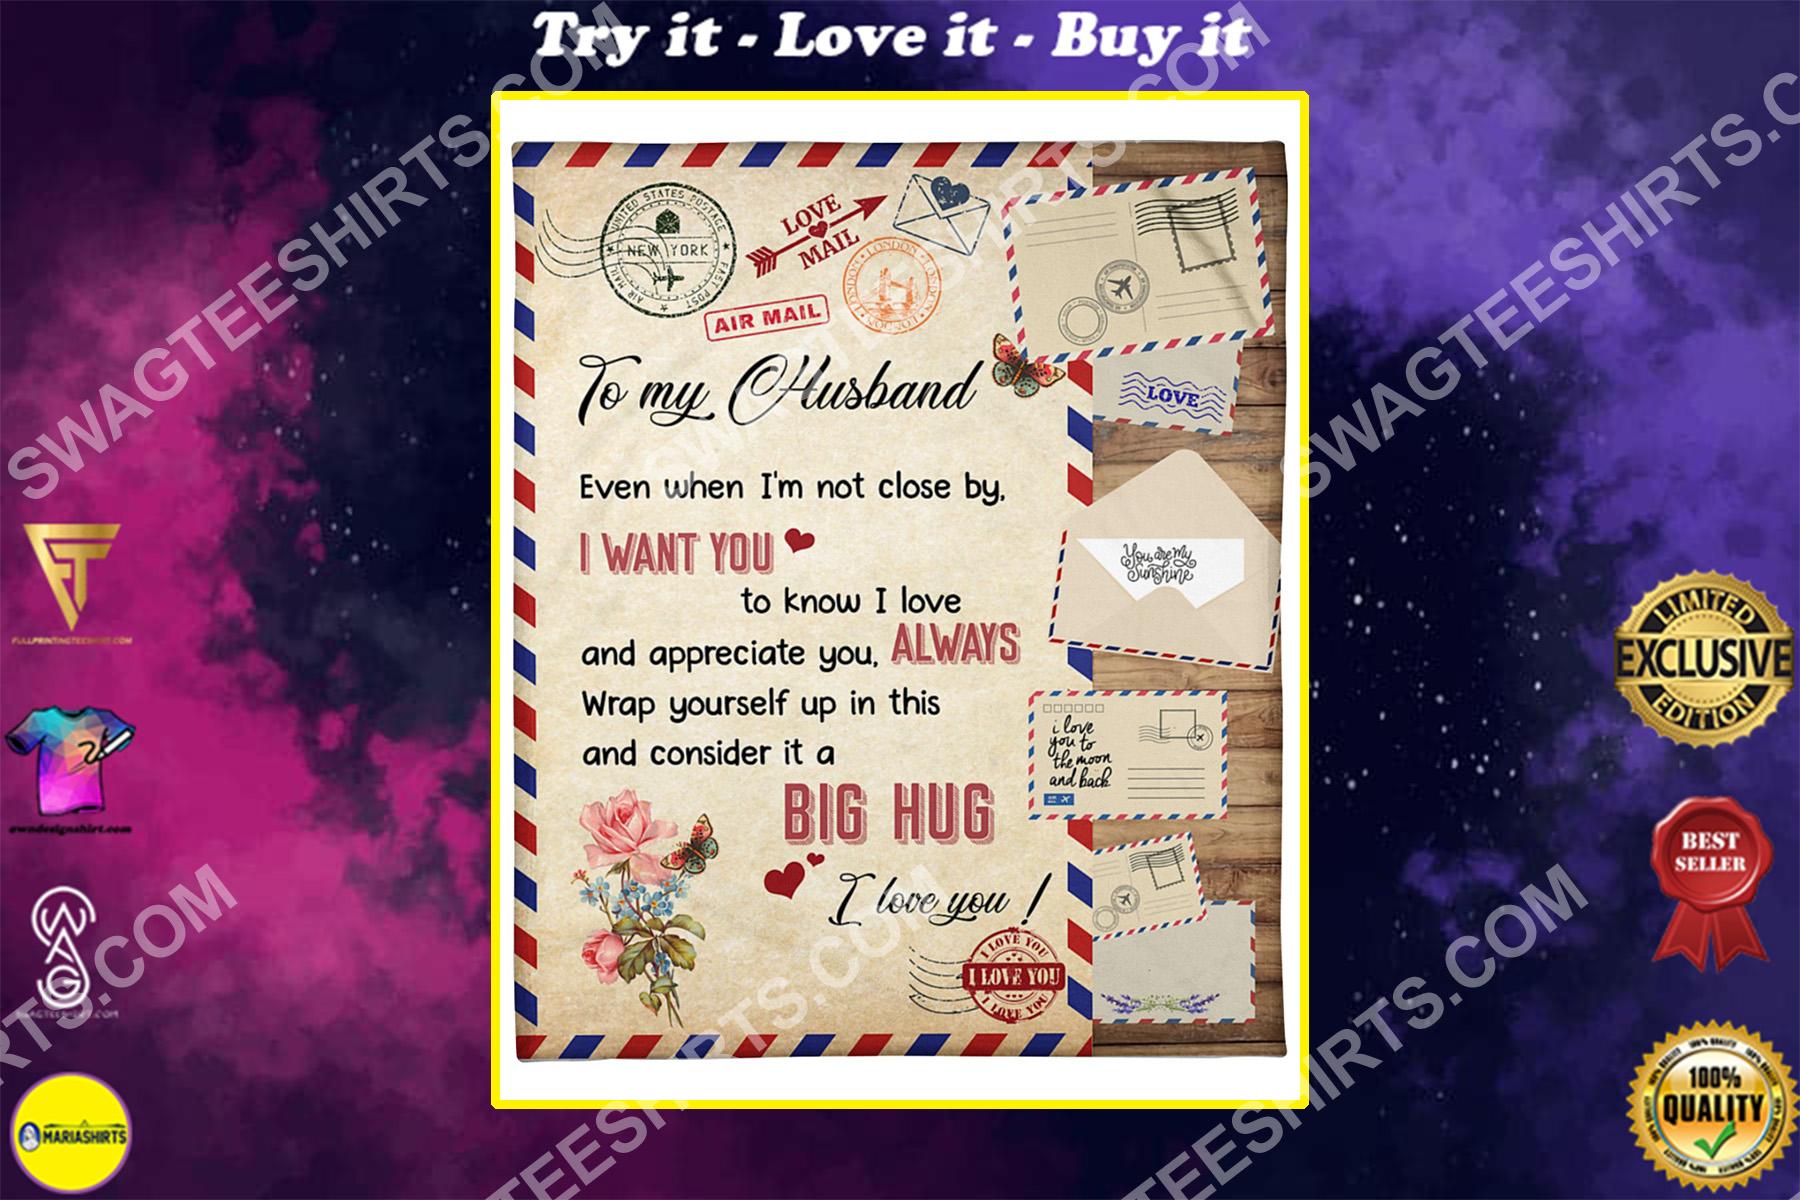 air mail to my husband i want you i love you blanket